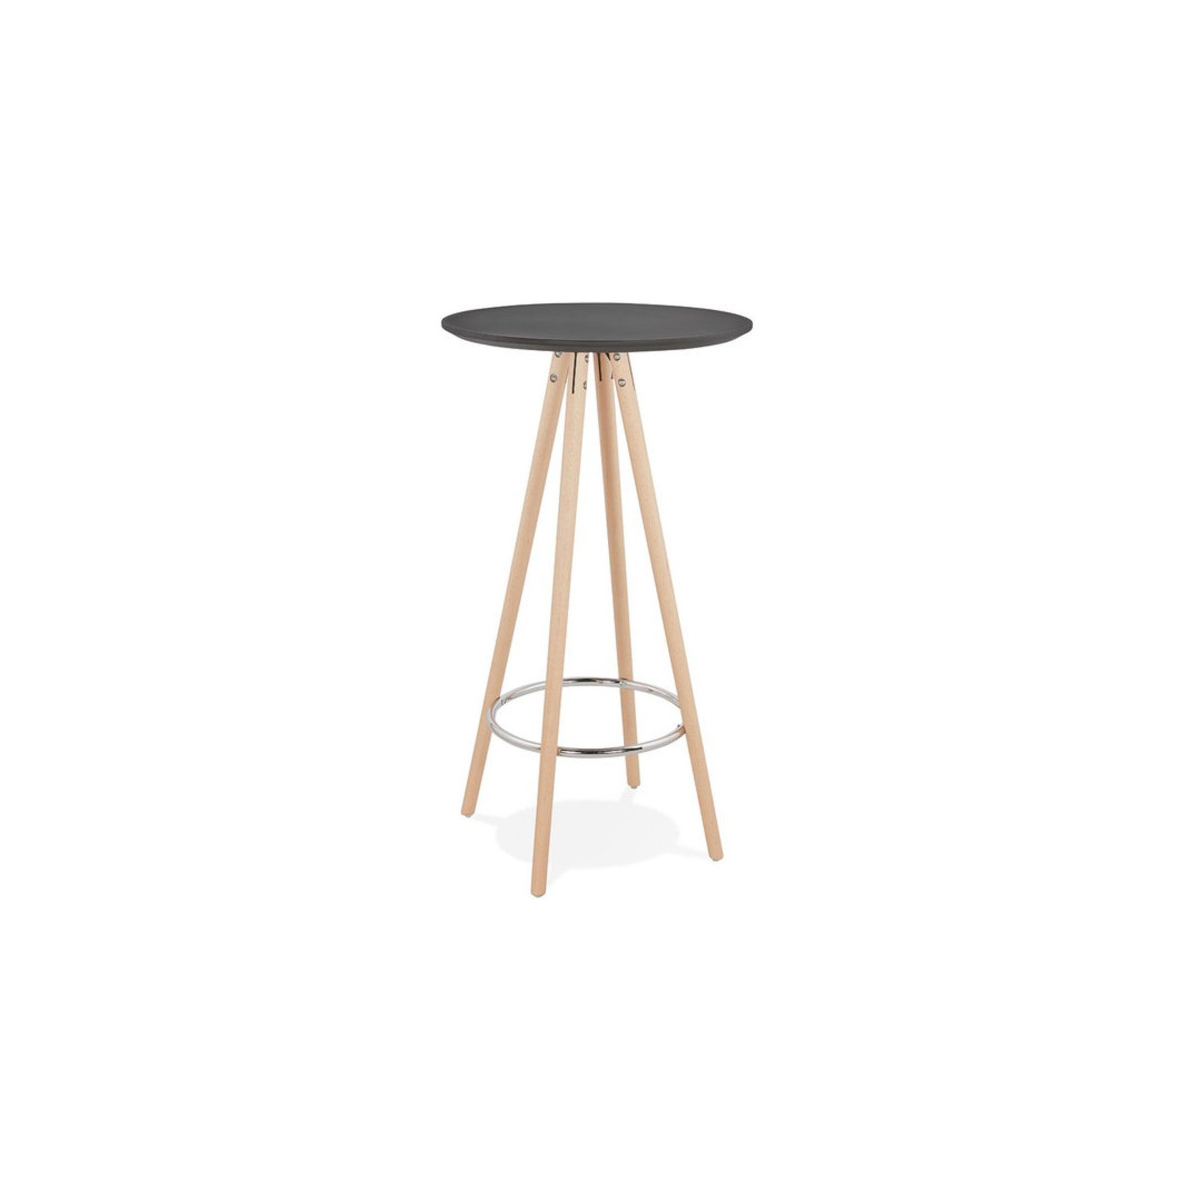 Stół barowy Kokoon Design Deboo